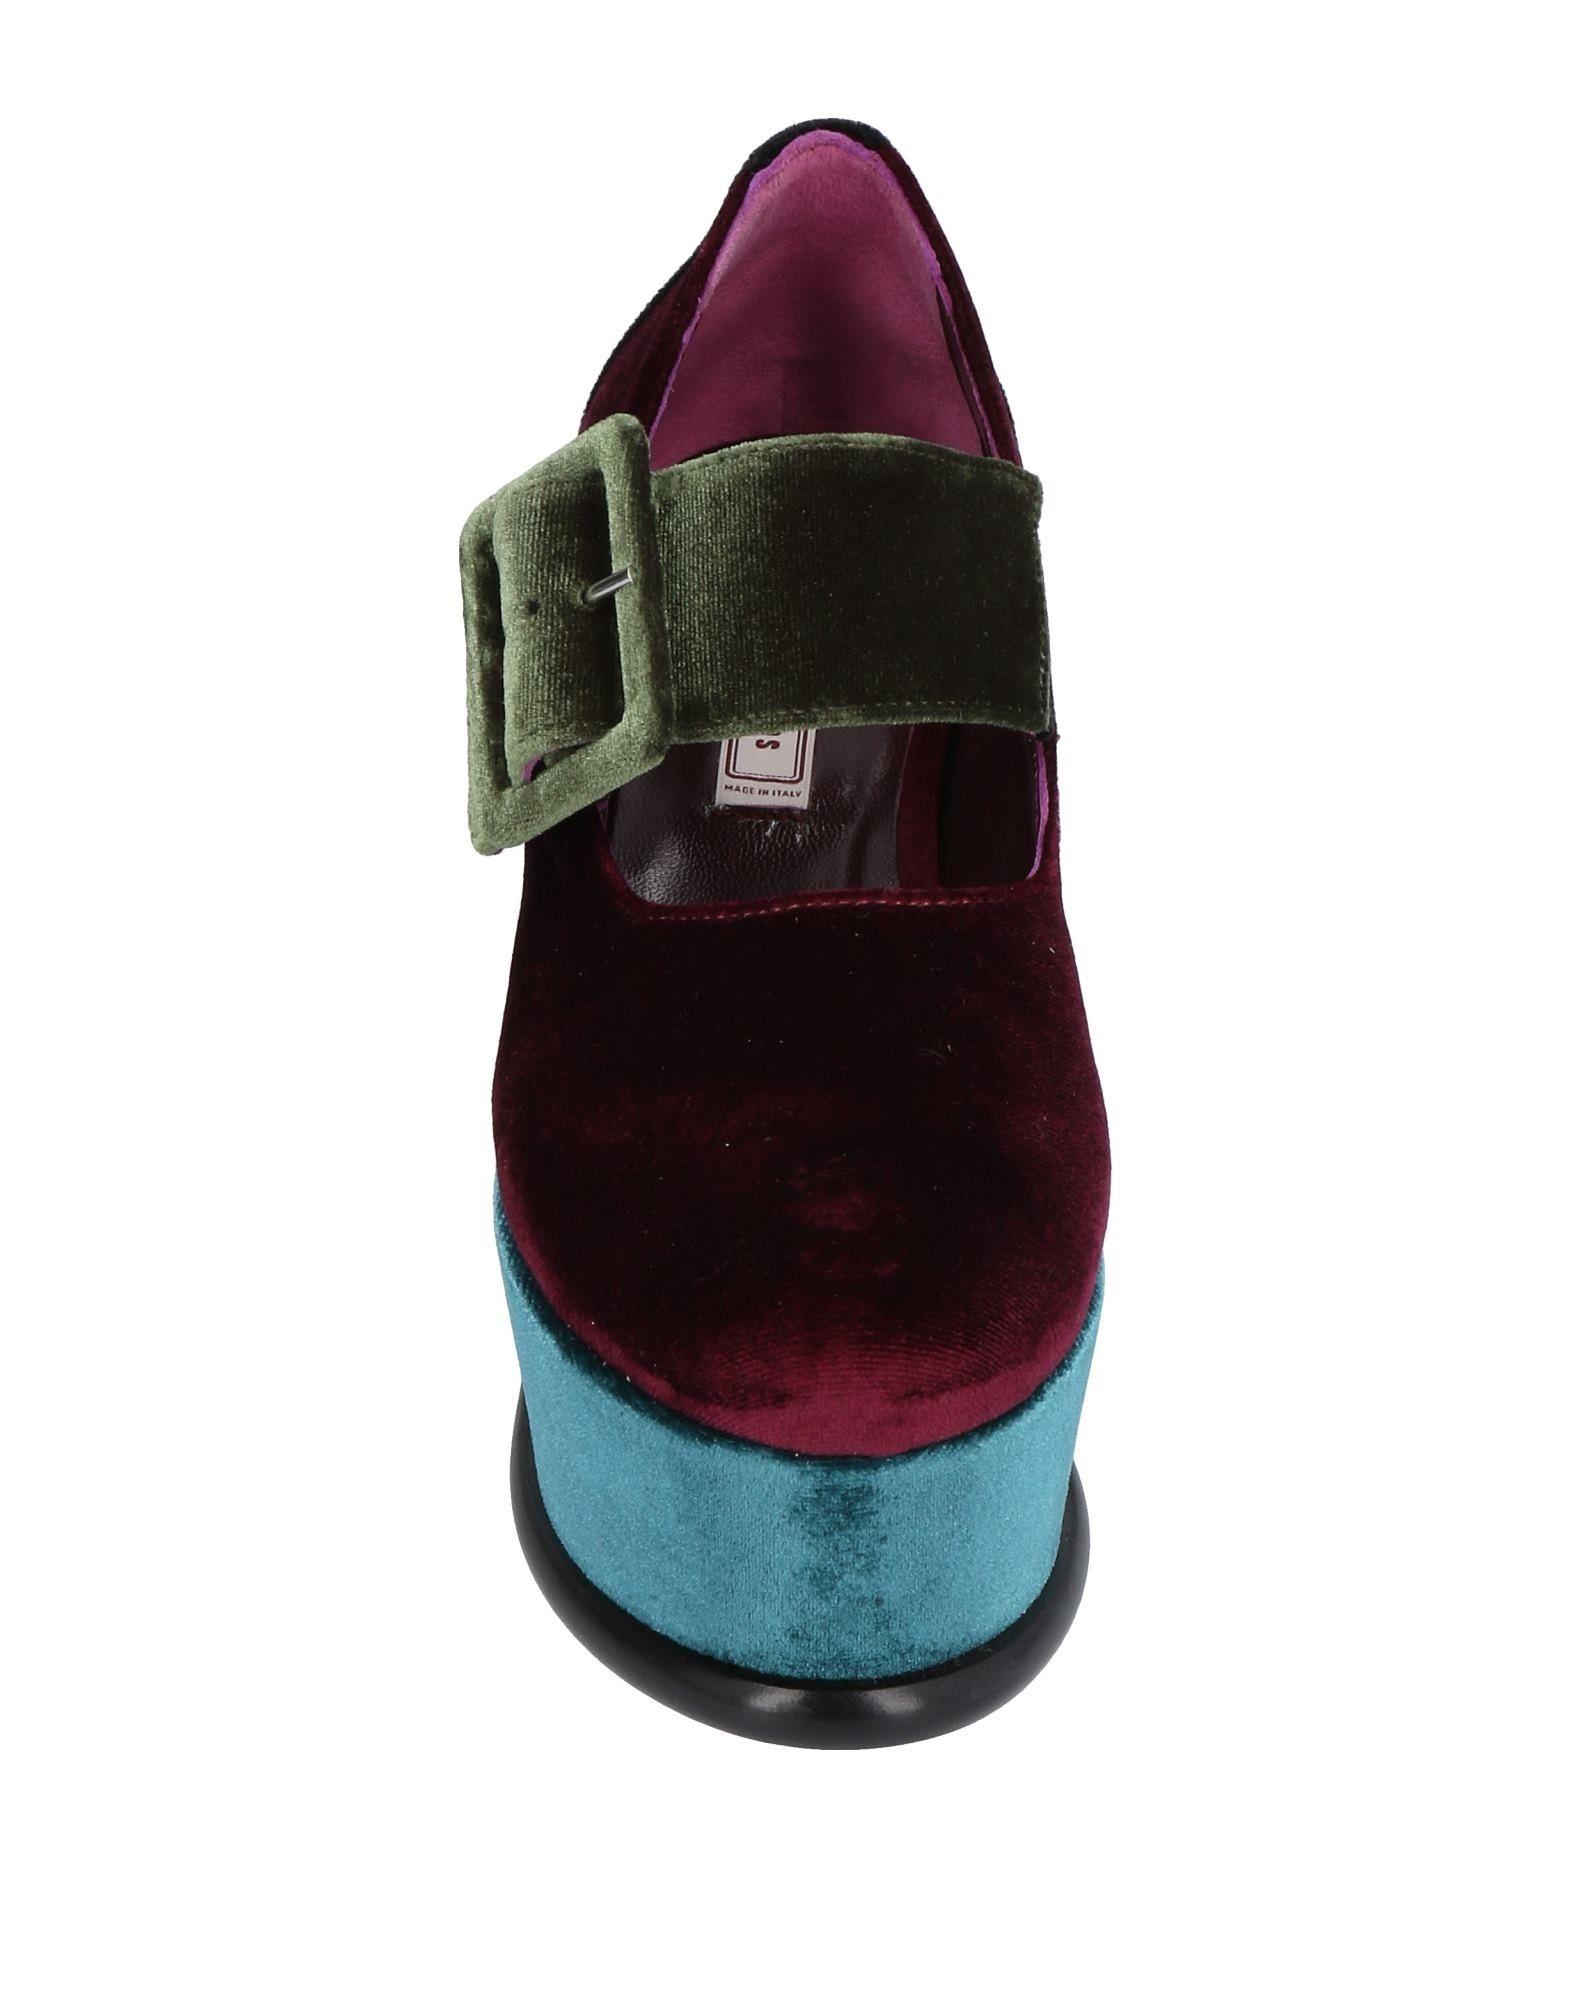 Stilvolle billige Schuhe Antonio Marras 11465935MC Pumps Damen  11465935MC Marras 52277f